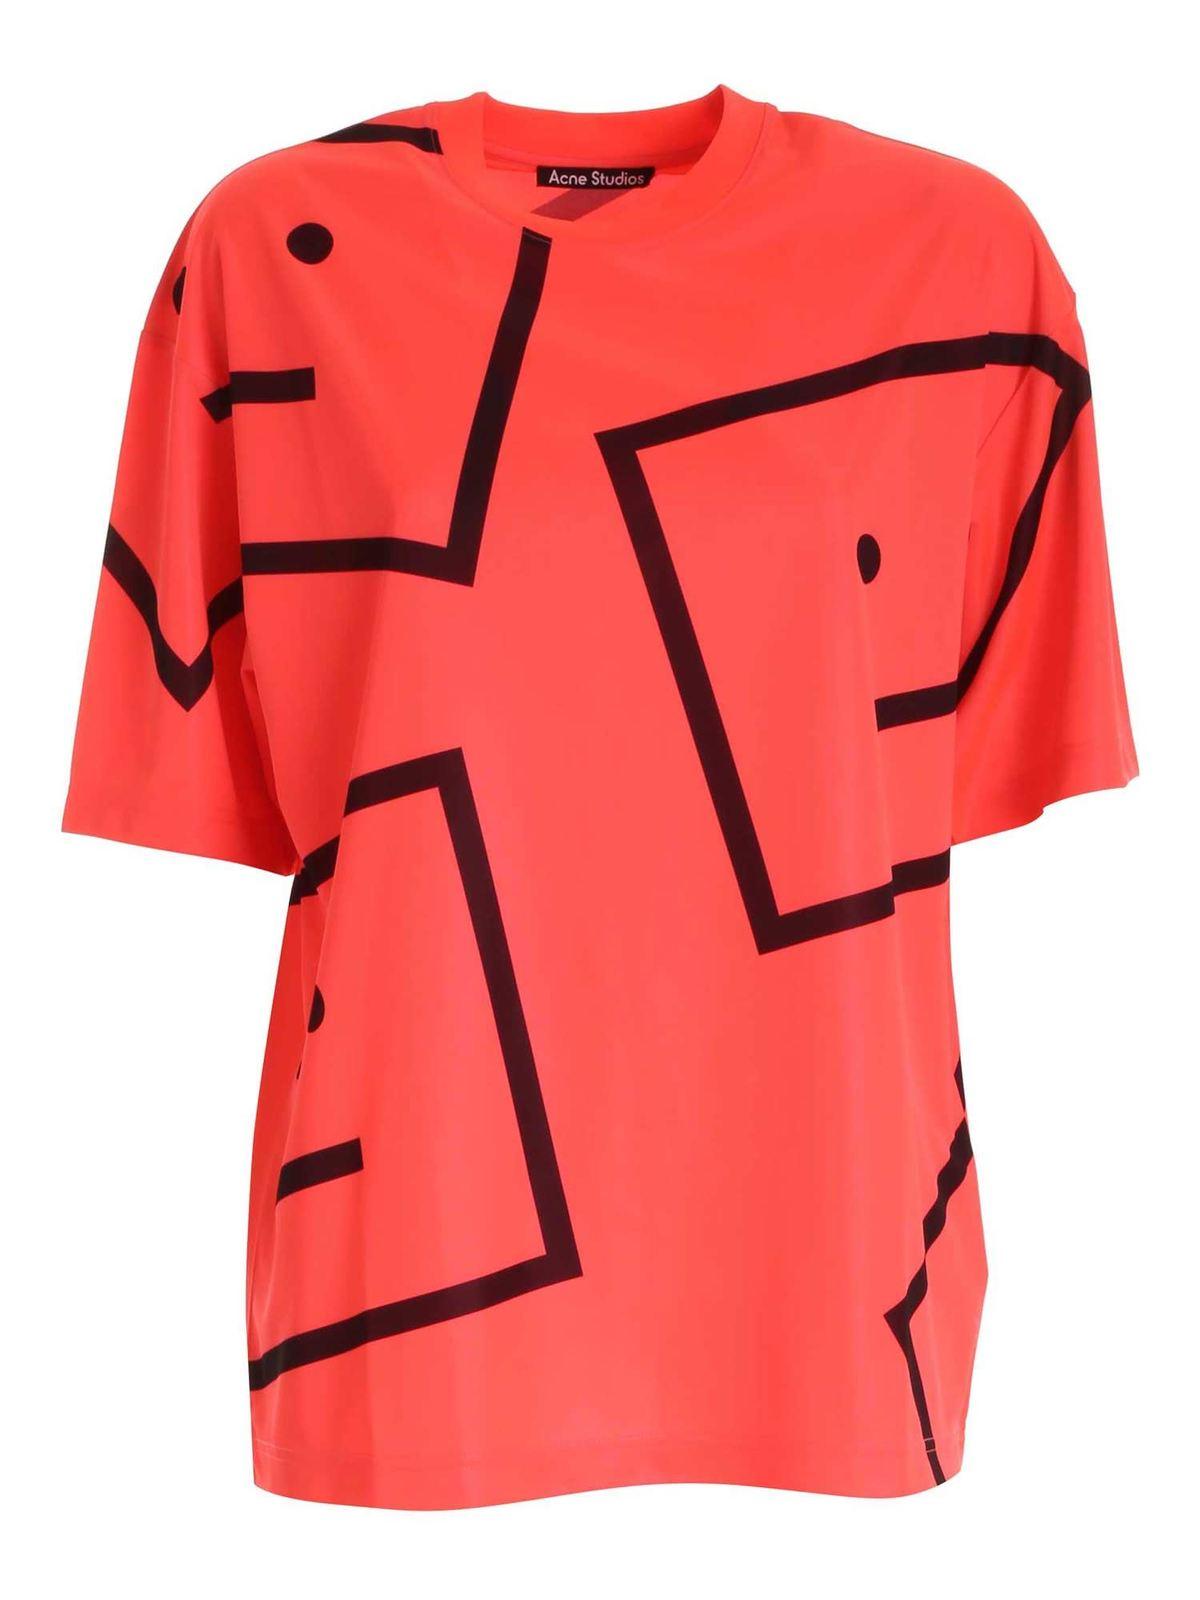 Acne Studios T-shirts LOGO T-SHIRT IN NEON PINK